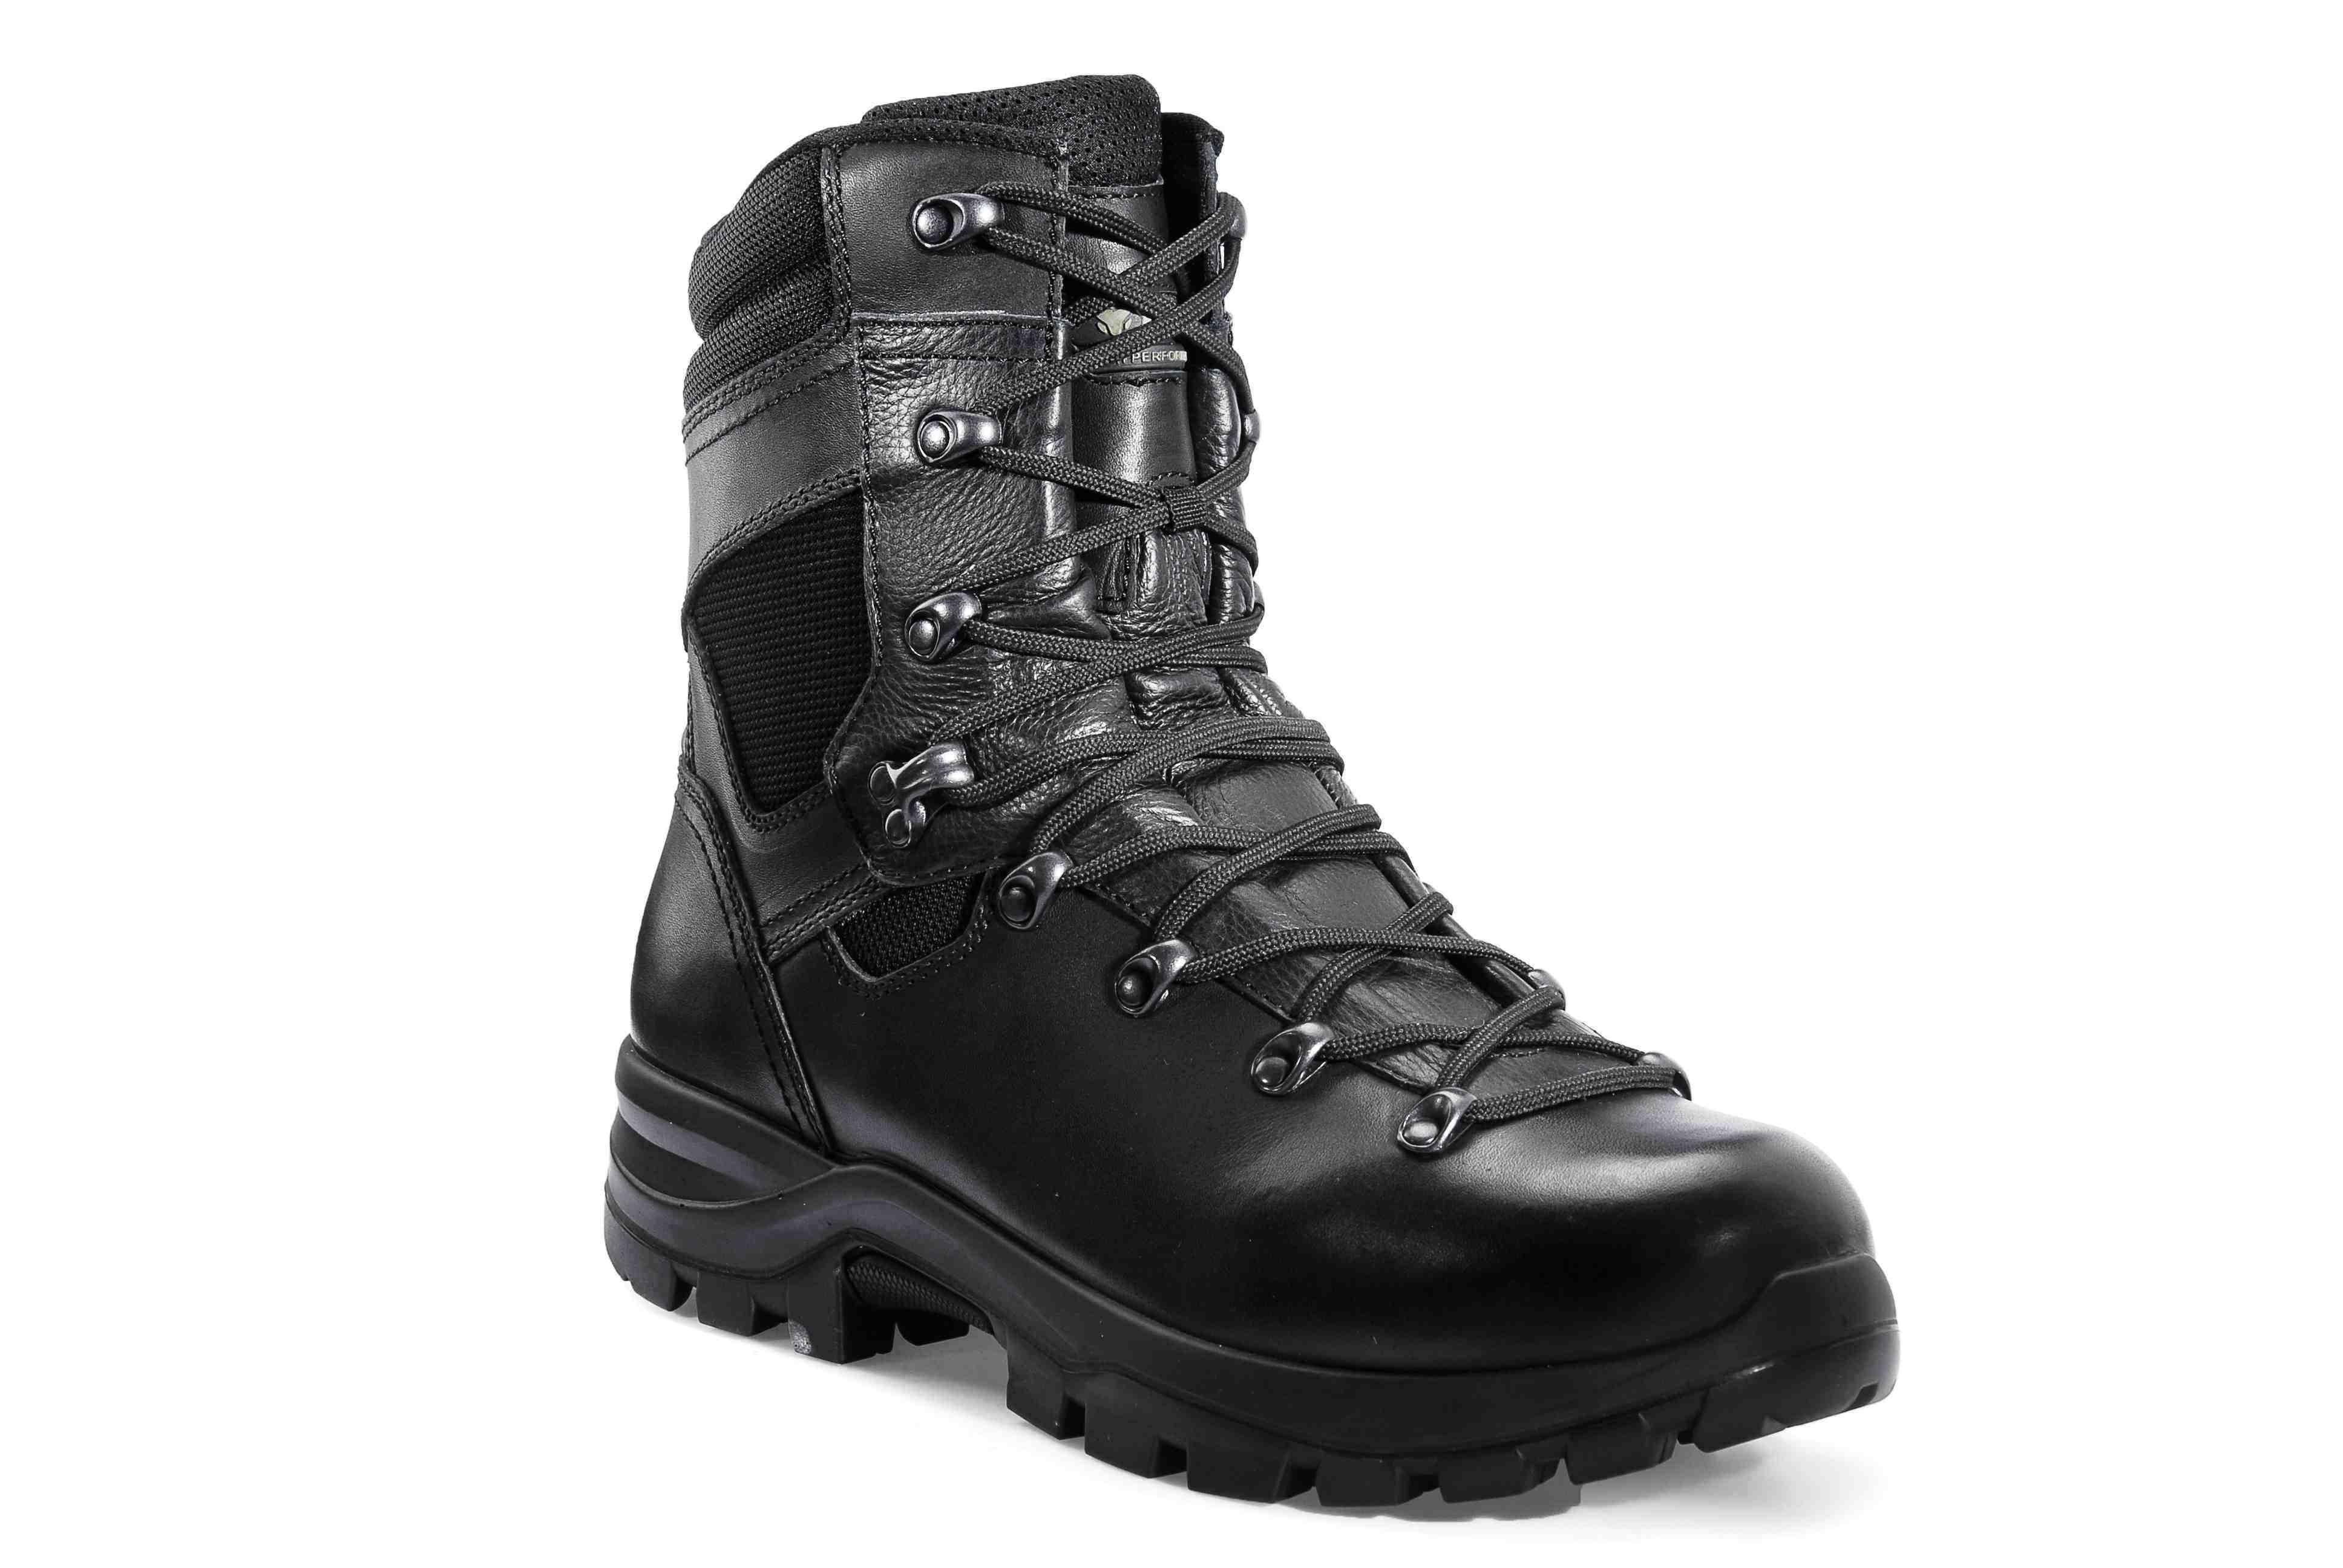 LeBOCK YDS Odin GTX Combat Boot 02 HRO HI WR FO SRA